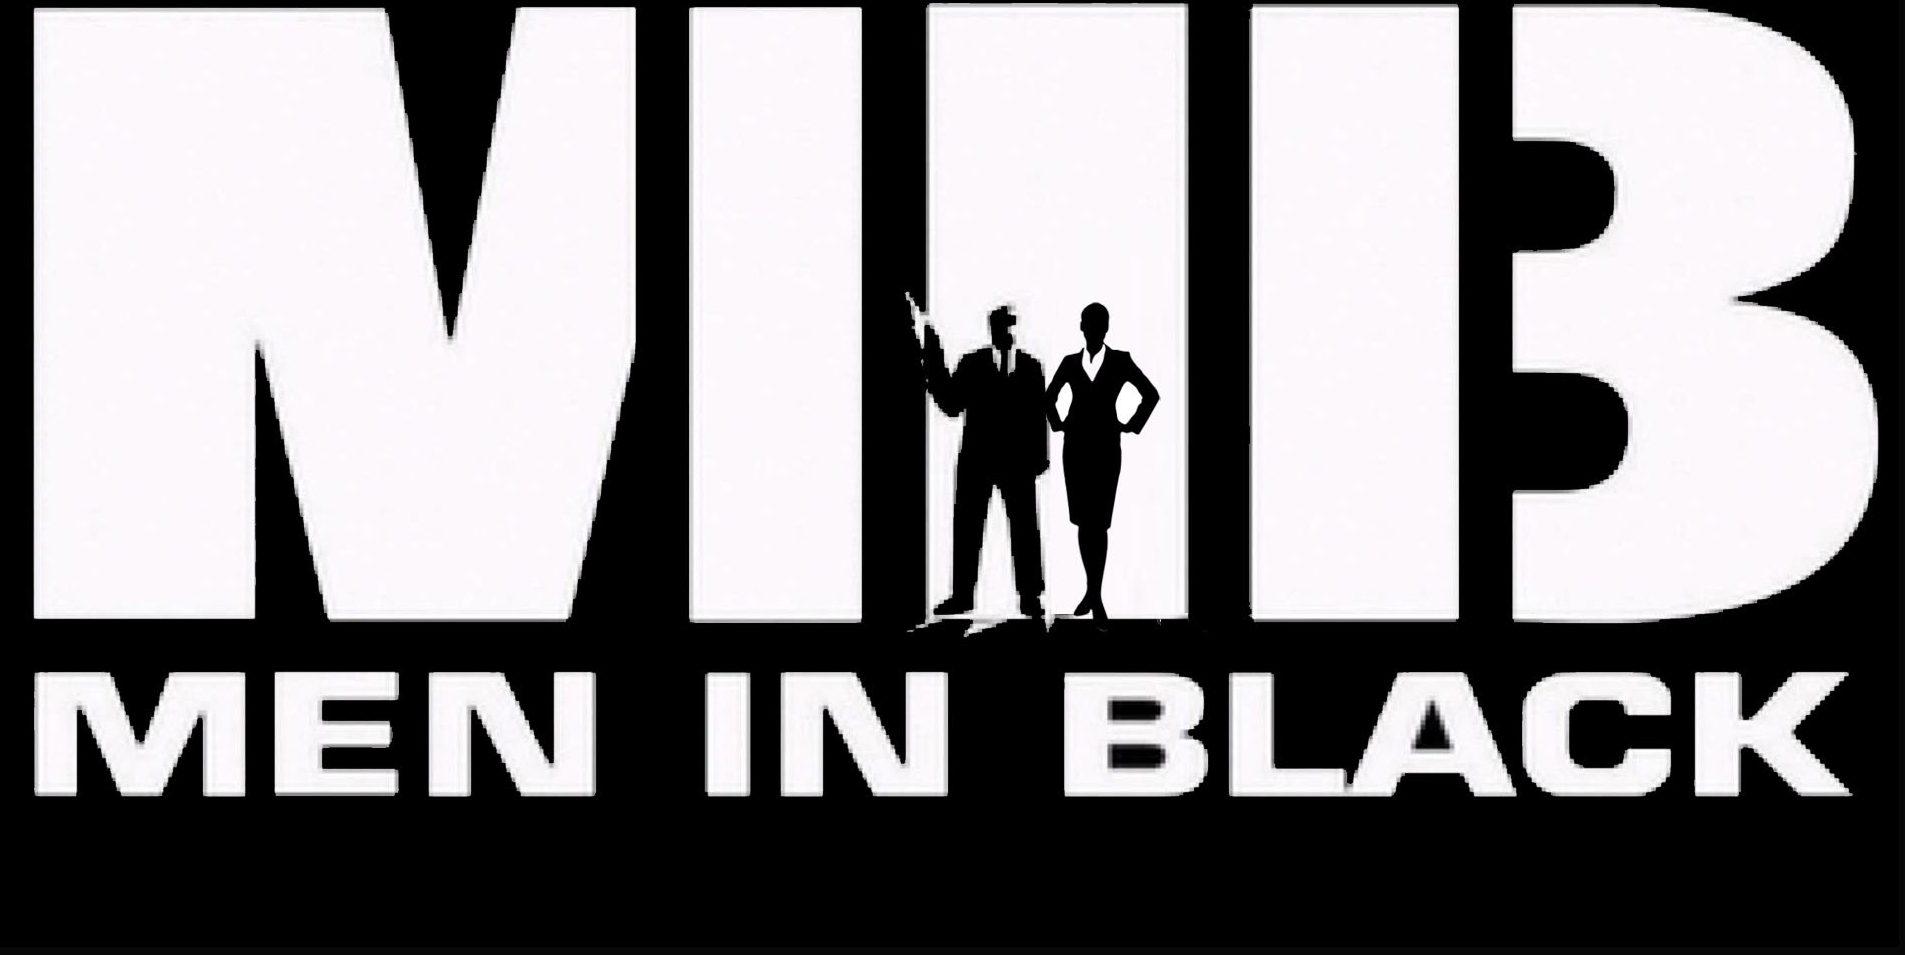 First Look: MEN IN BLACK.